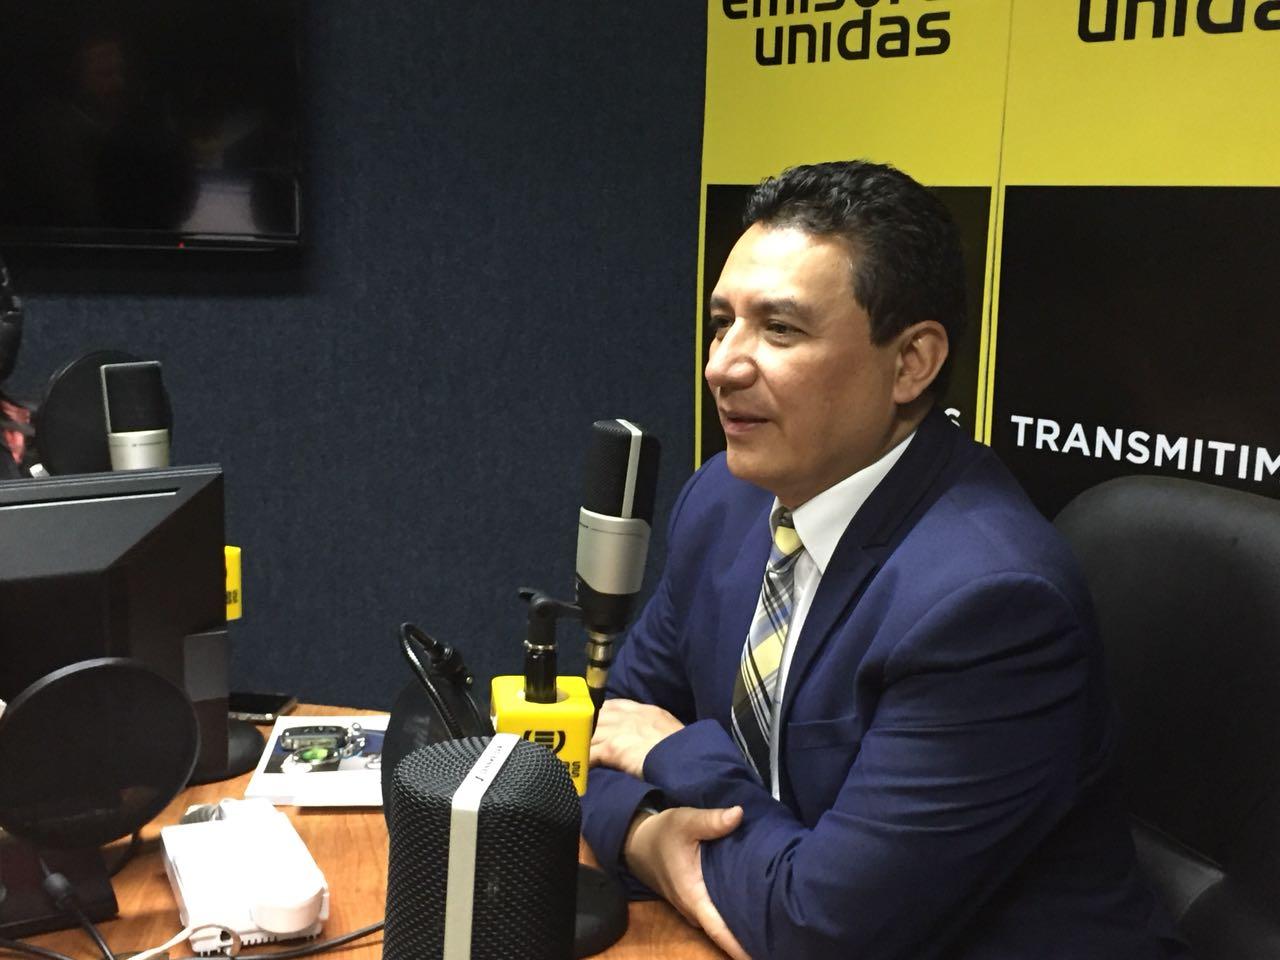 Director del Inguat EU Emisoras Unidas Guatemala